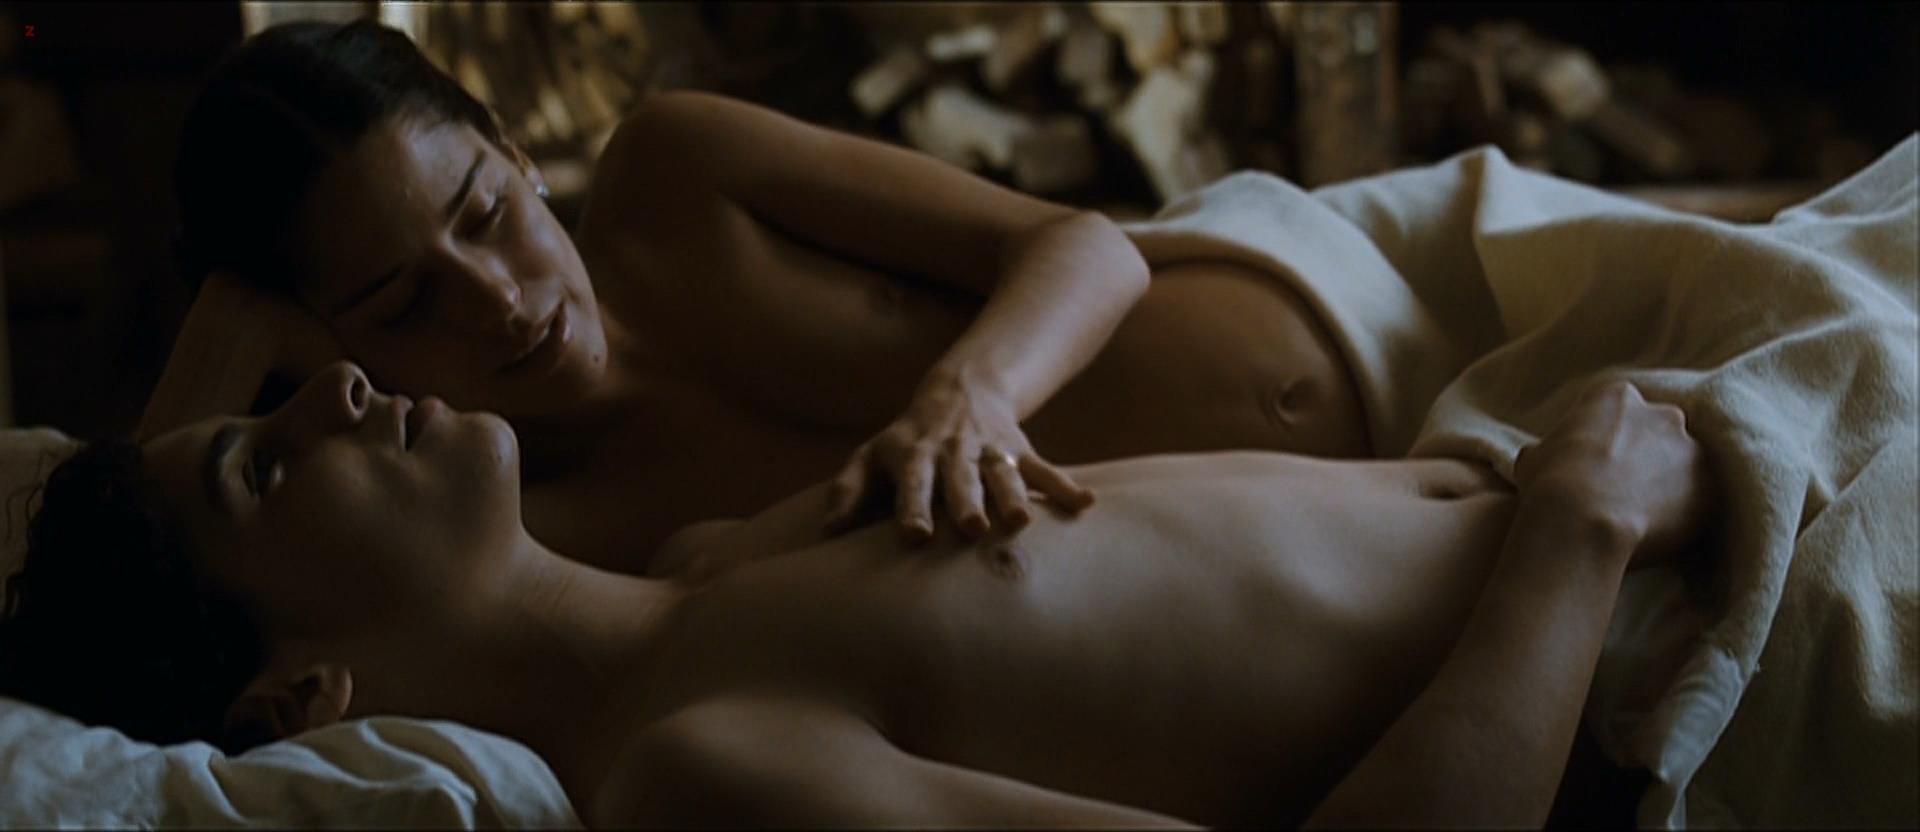 ana claudia nude sex